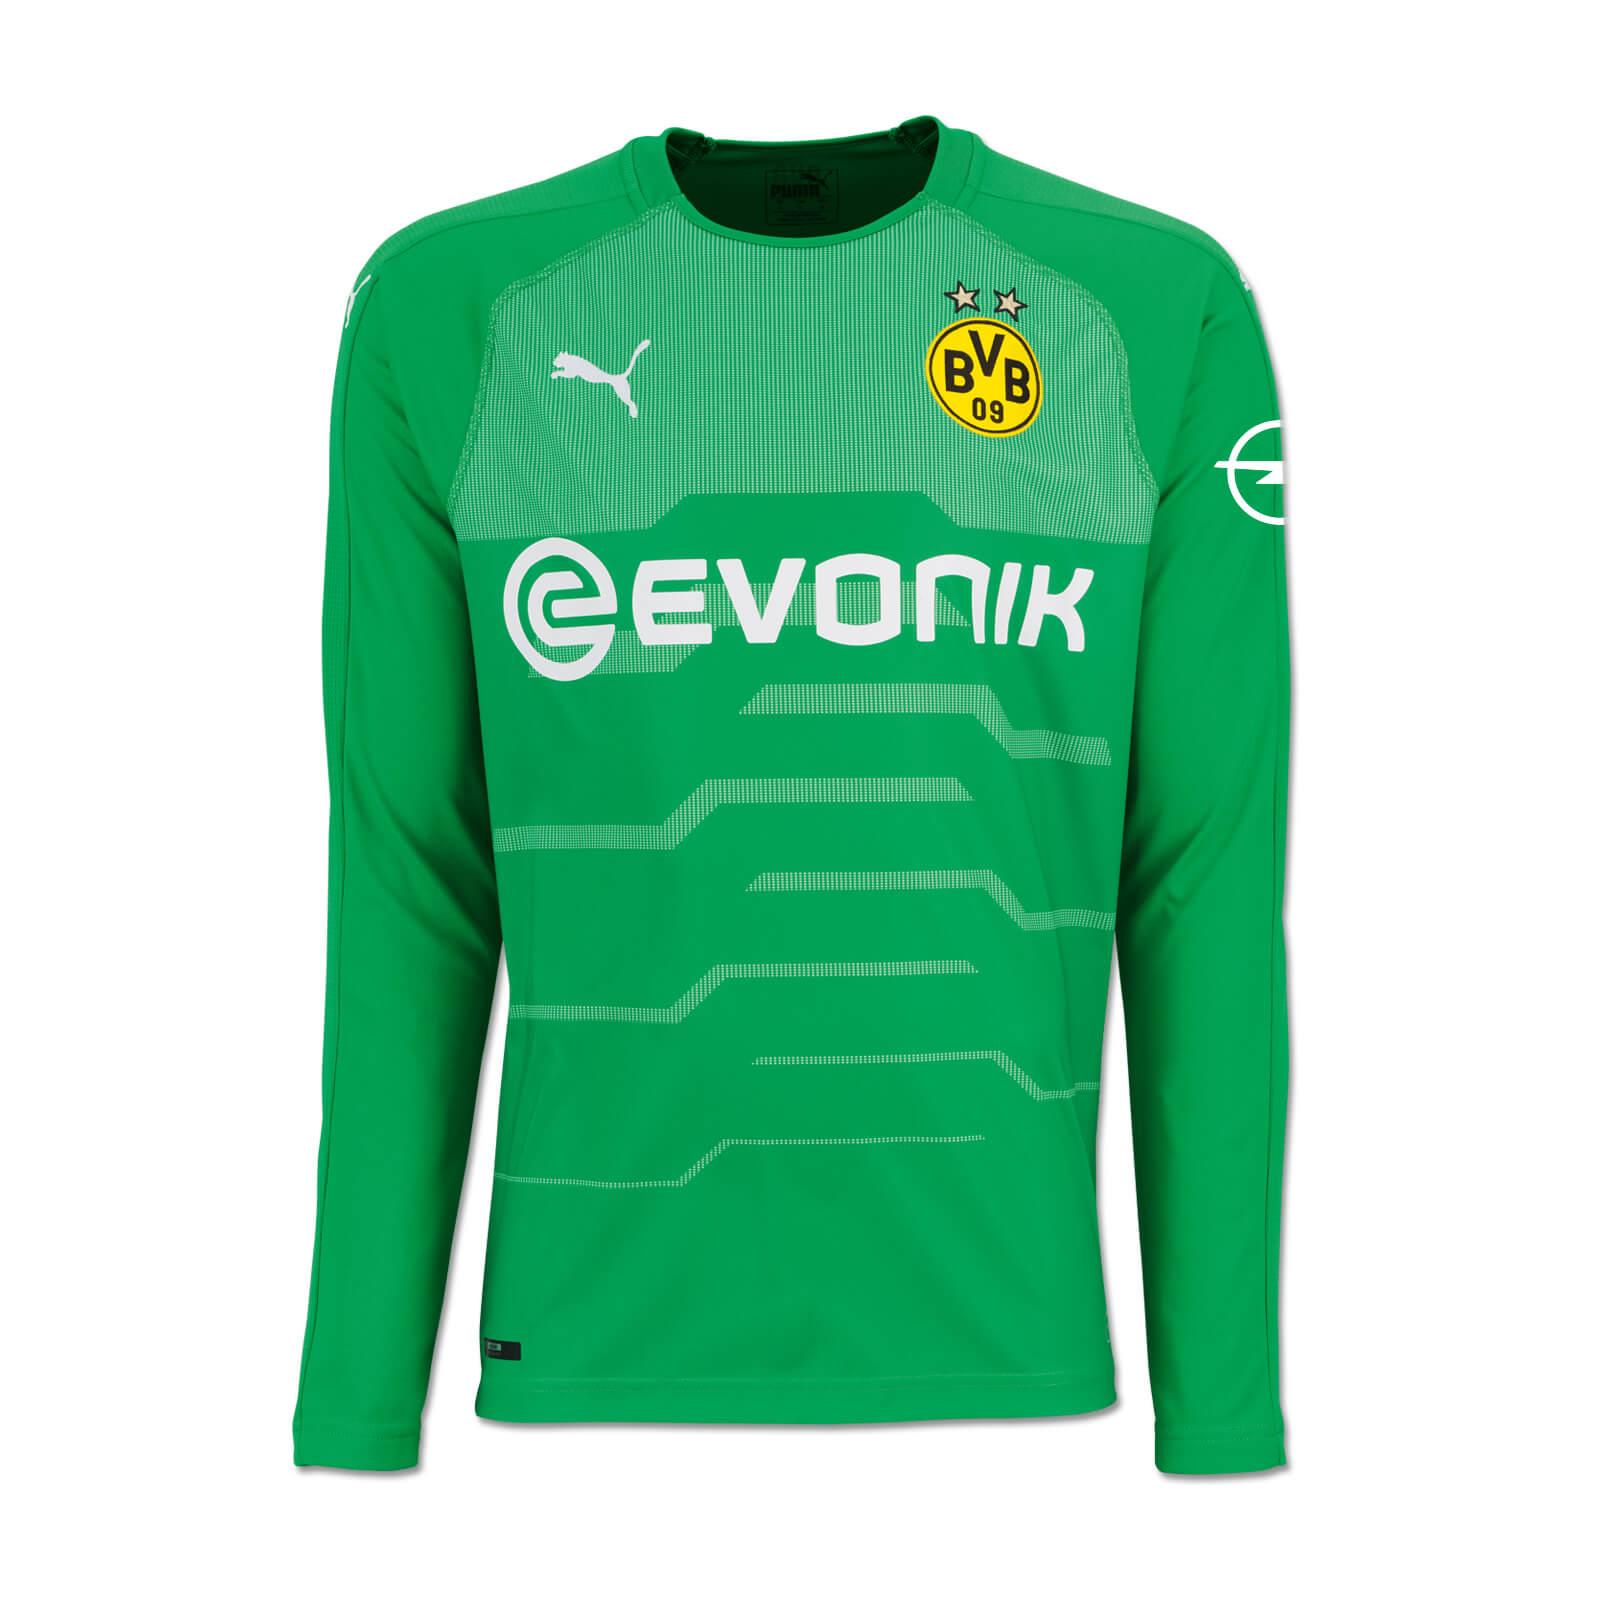 release date d5f20 247ea Borussia Dortmund Goalkeeper Jersey 2018-19 - green